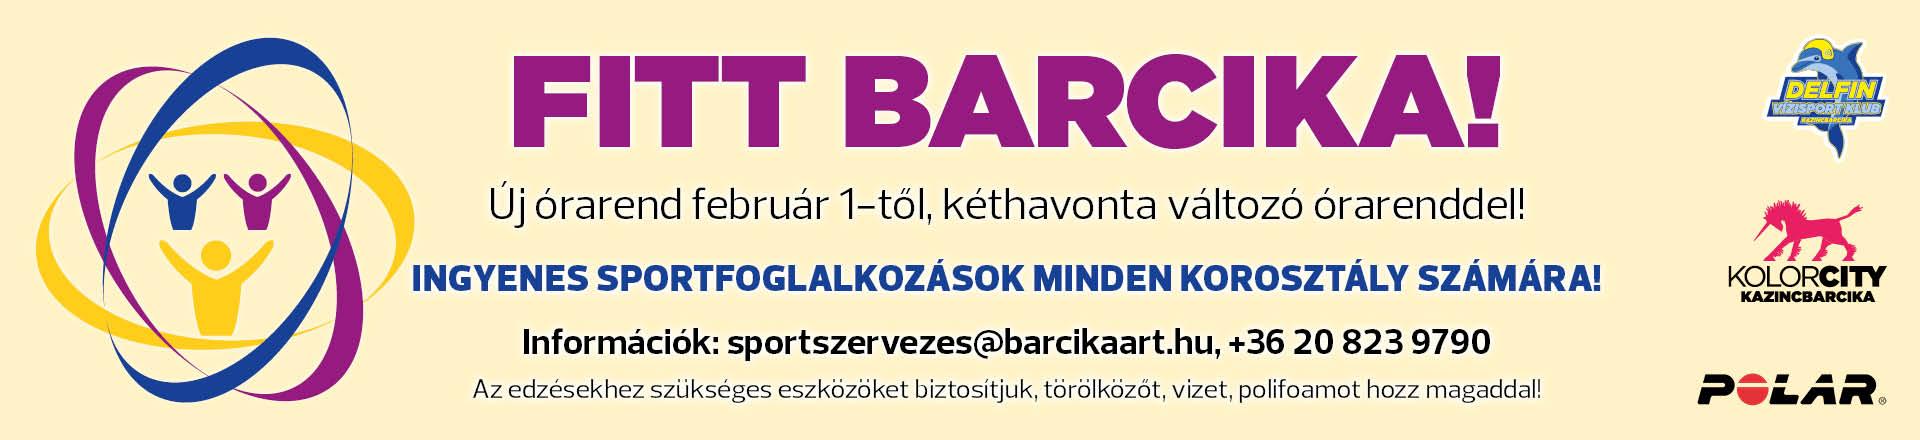 fitt_barcik